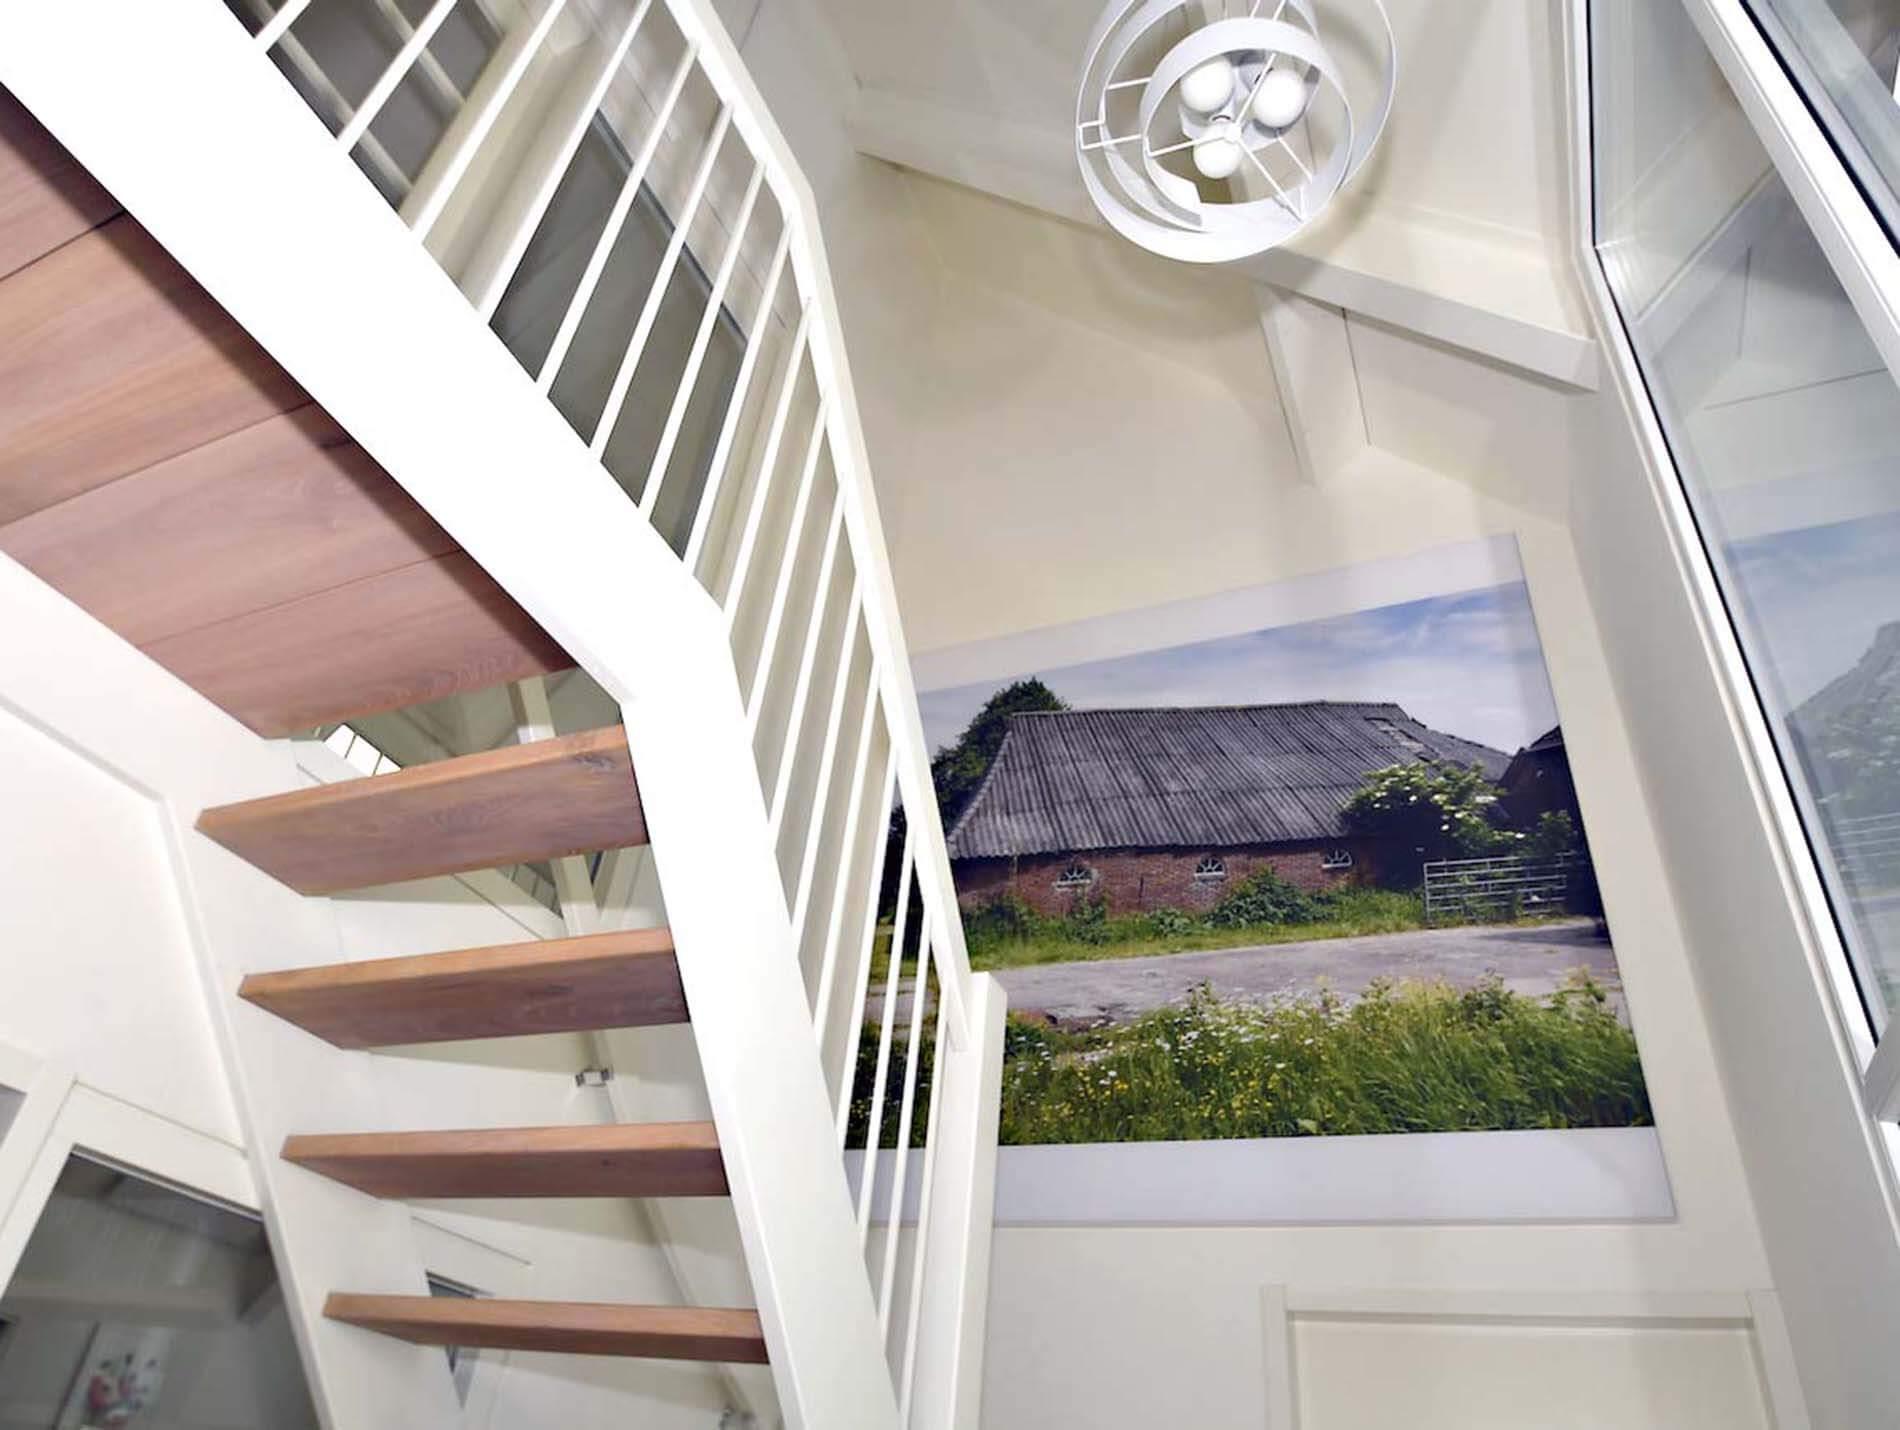 4. Wijnjewoude-particuliere-woning-interieur-1900x1430p.jpg